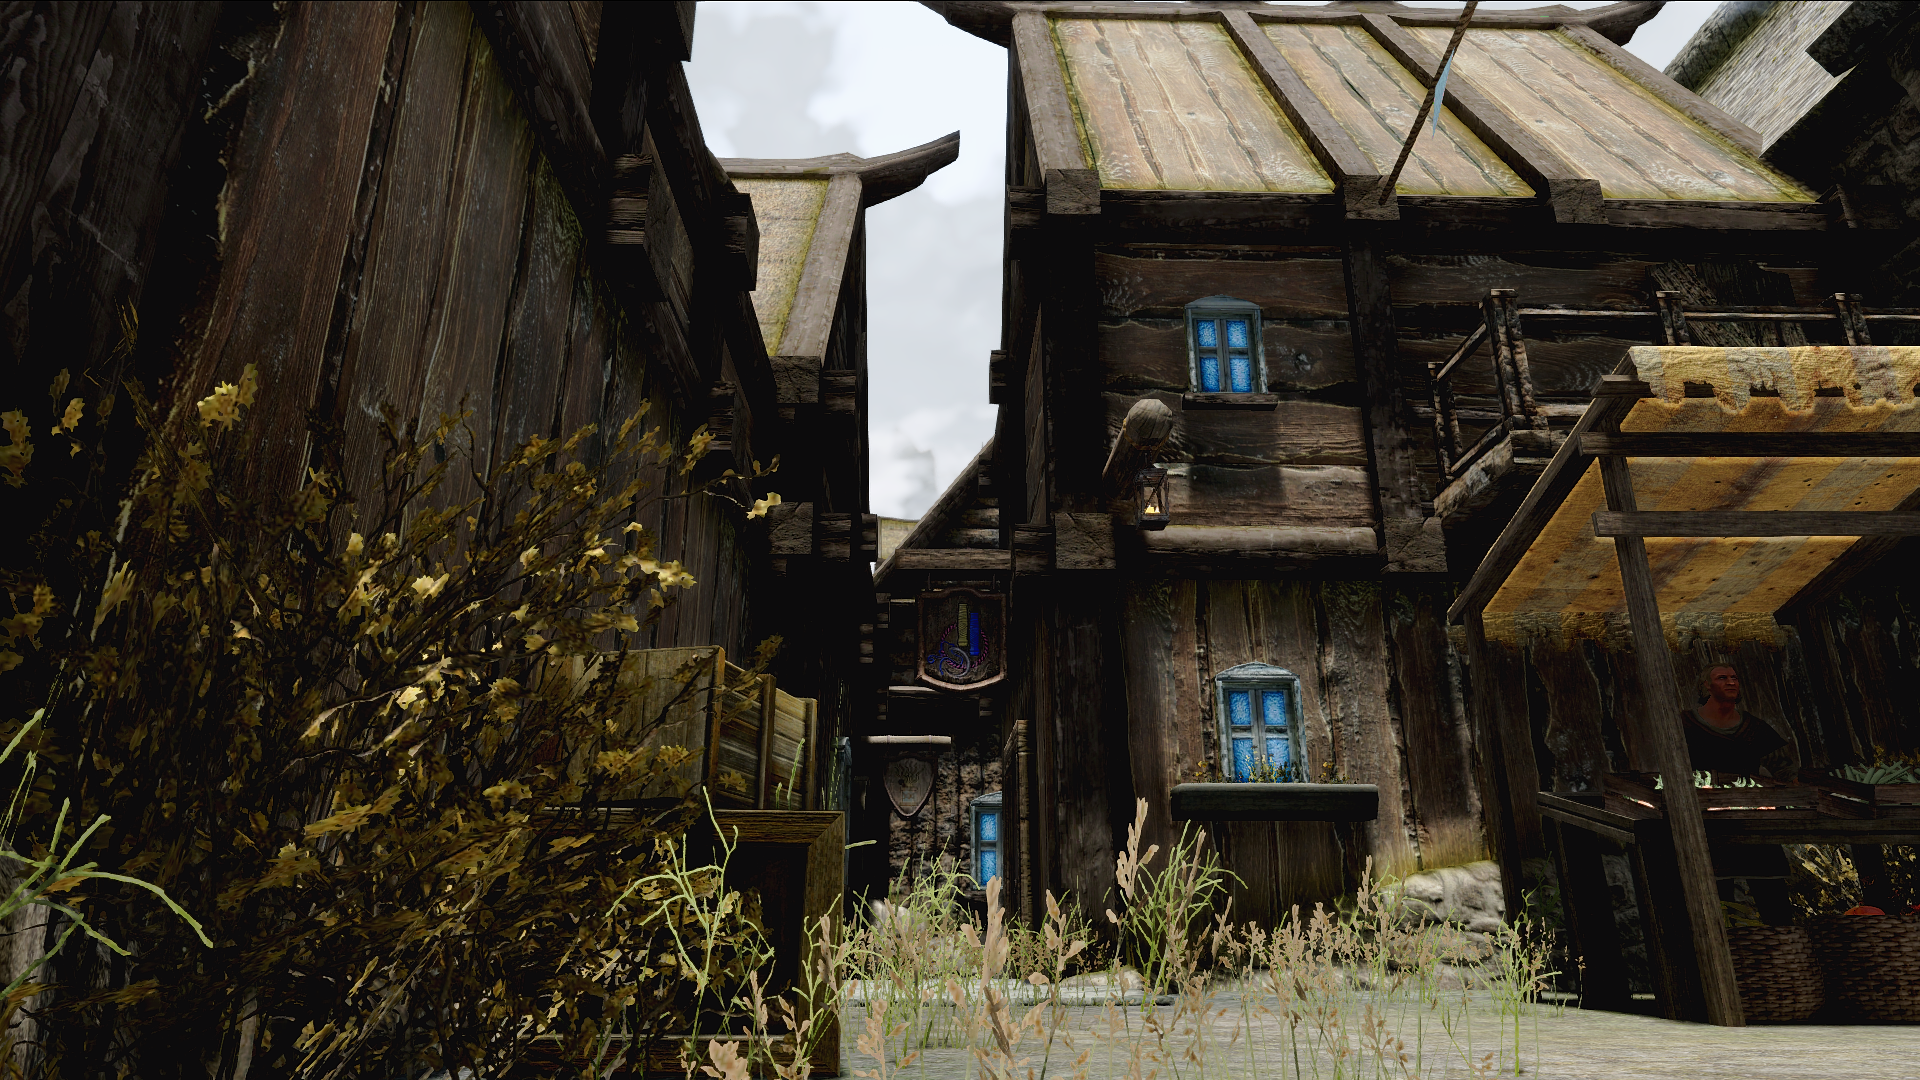 Shezrie's Old Hroldan Town